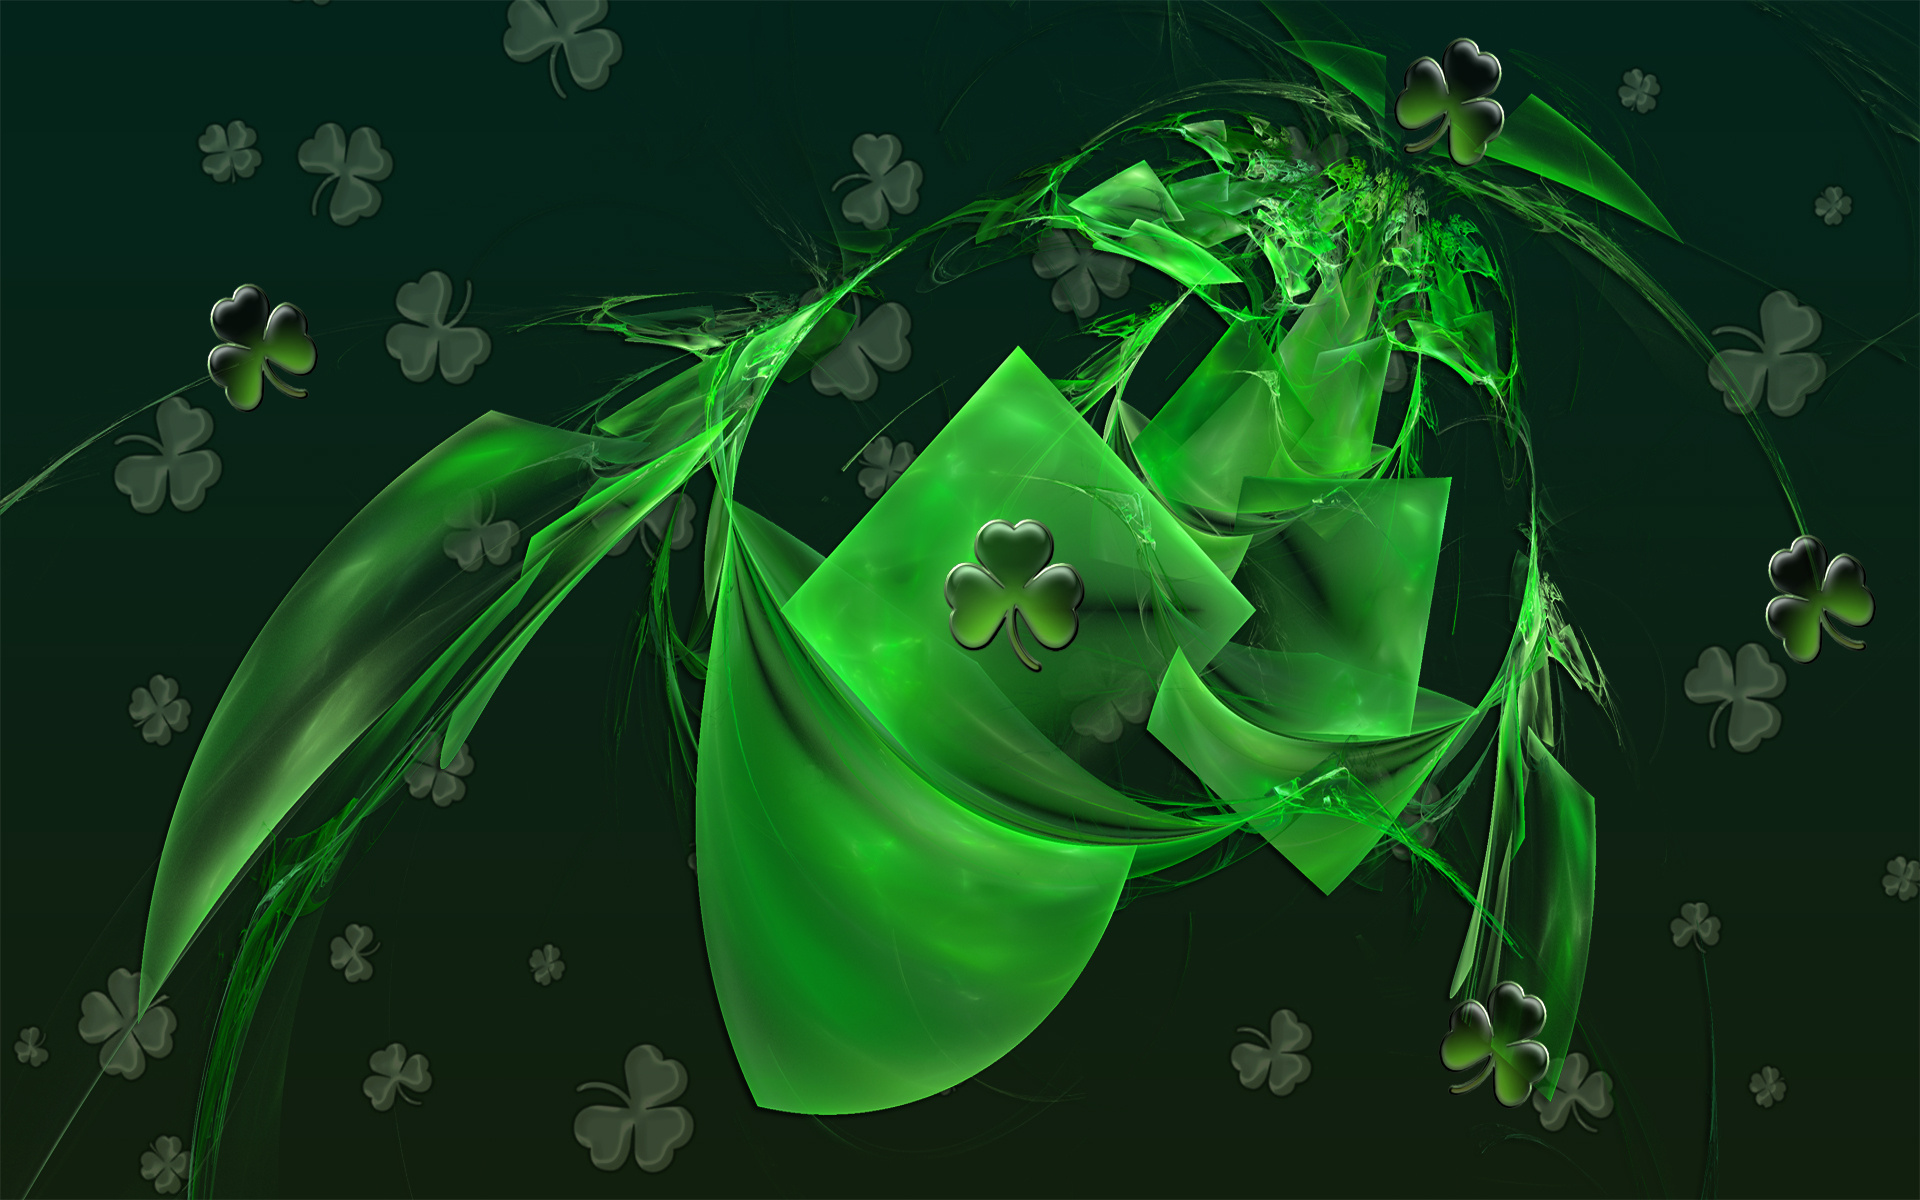 St Patricks Day wallpaper   367950 1920x1200